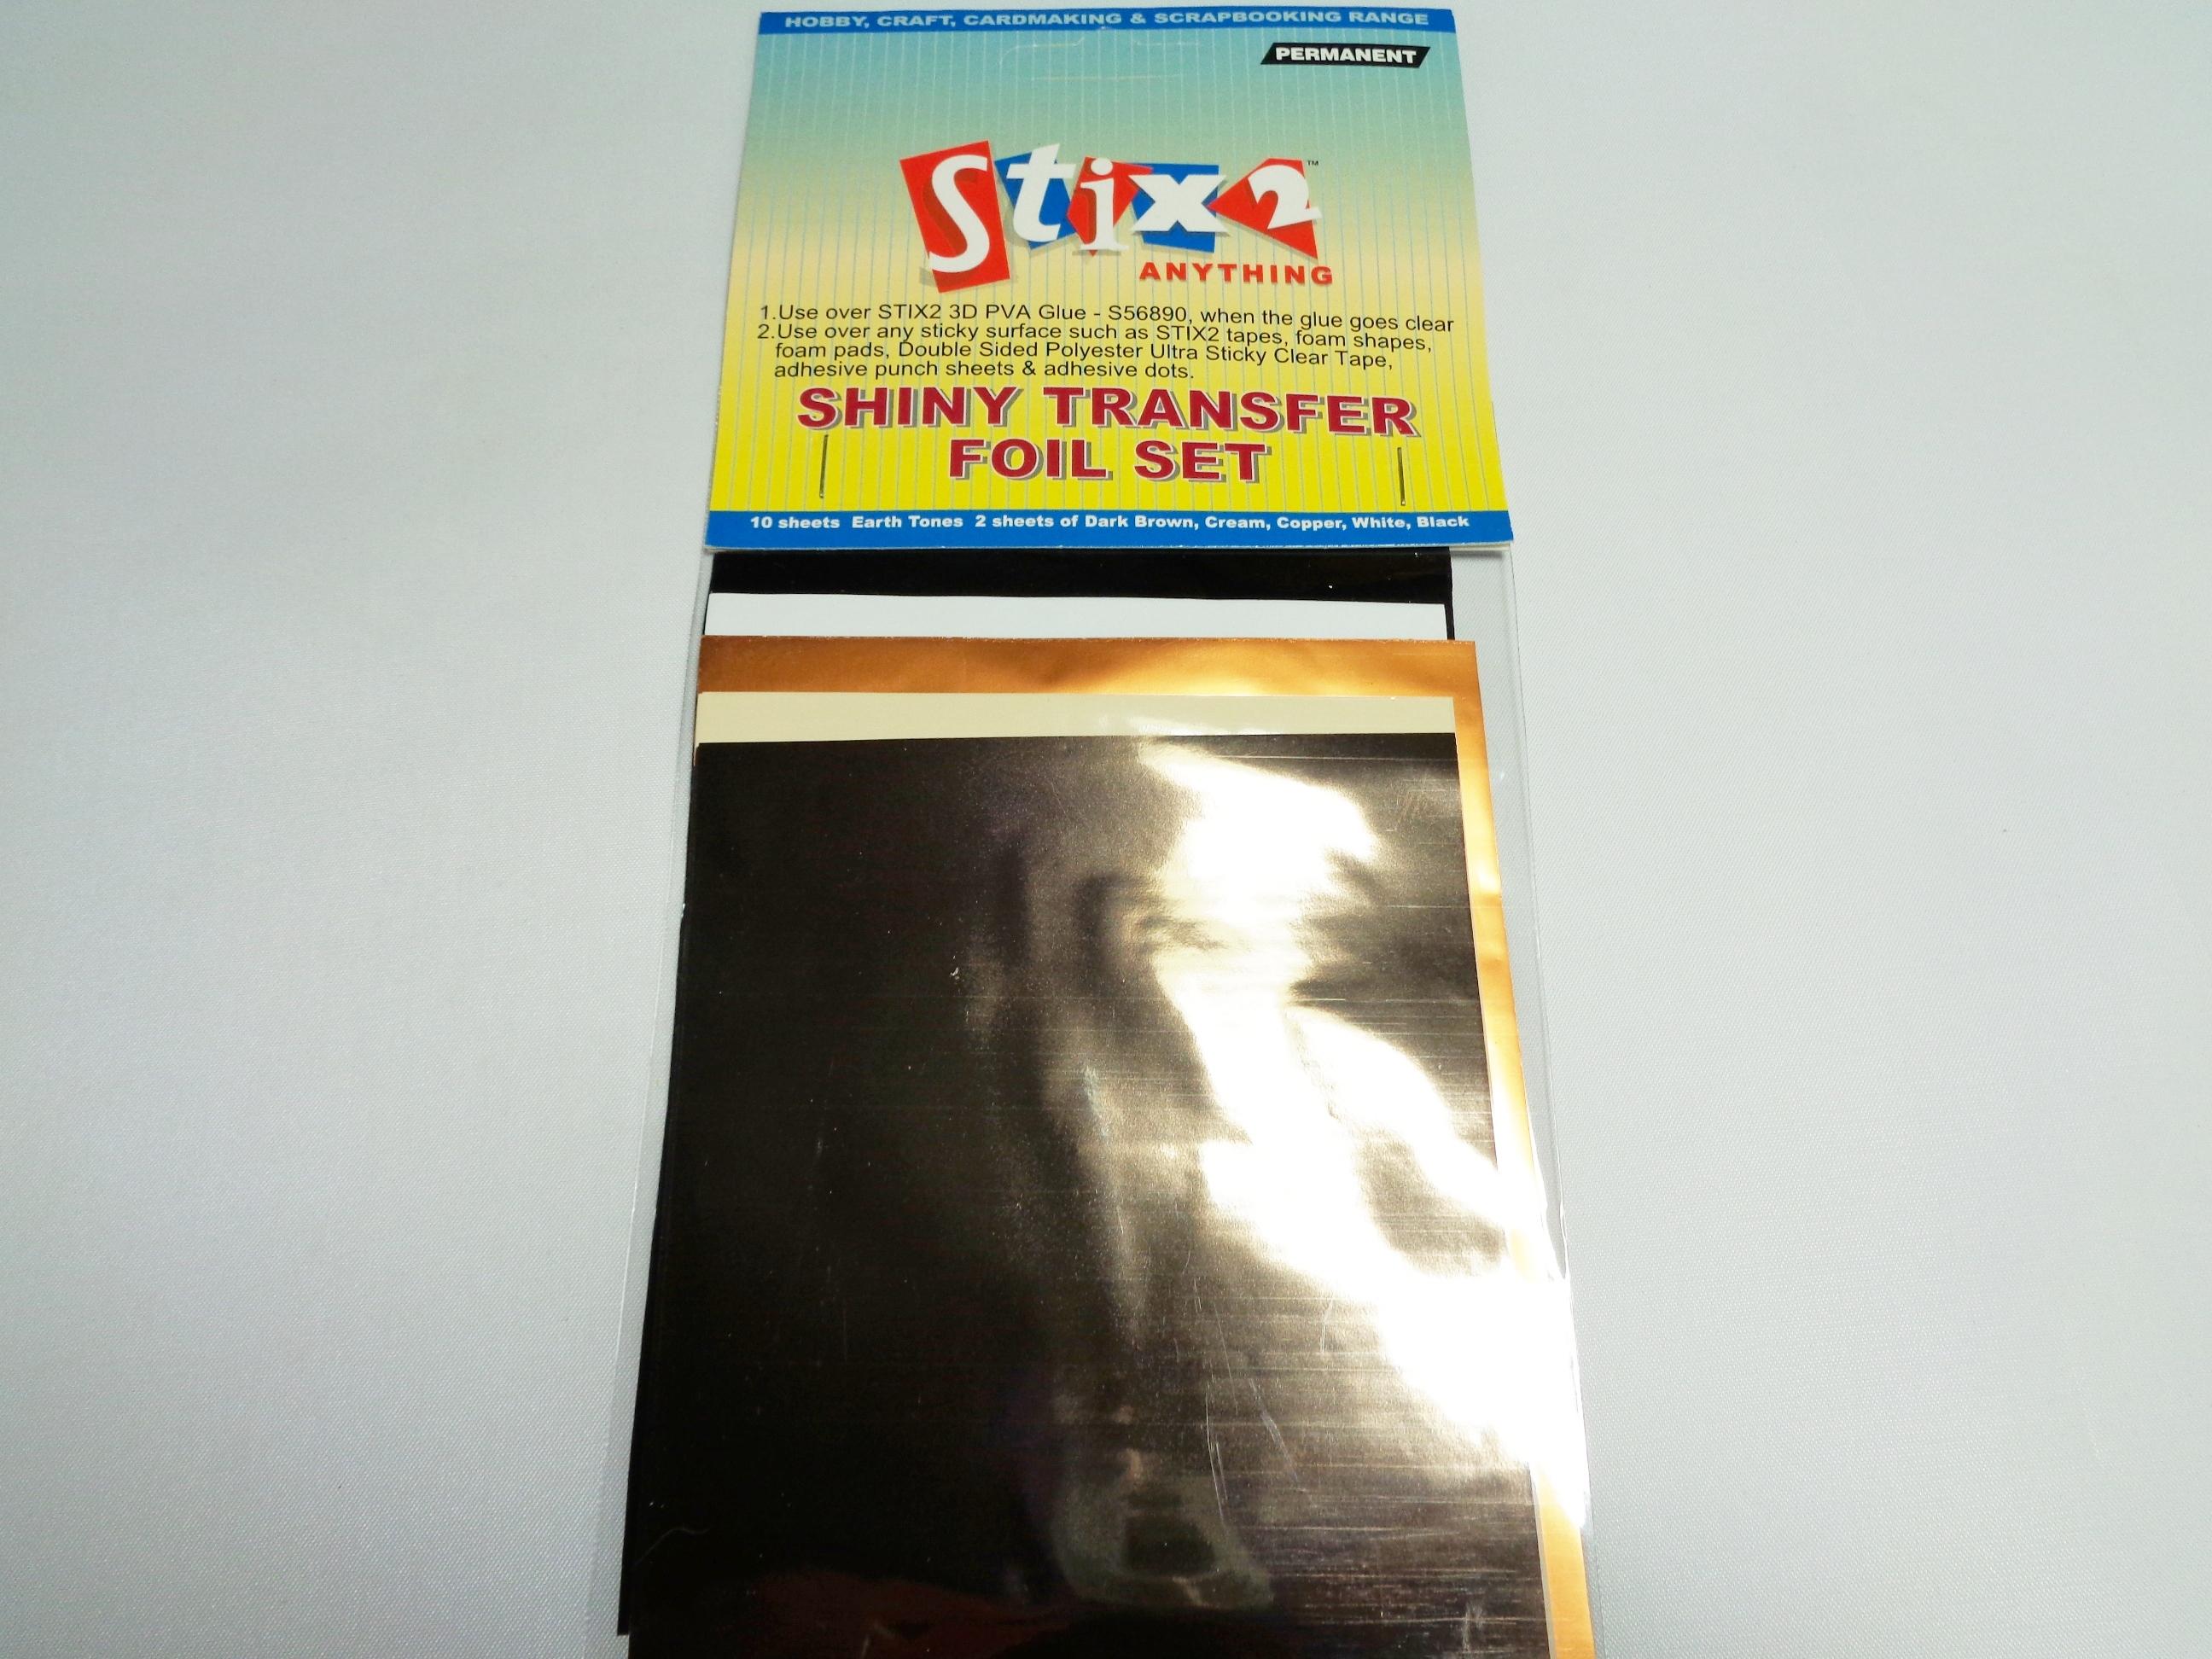 Shiny Transfer Foils -Celebration Scrapbooking Stix2 Craft cardmaking Hobby